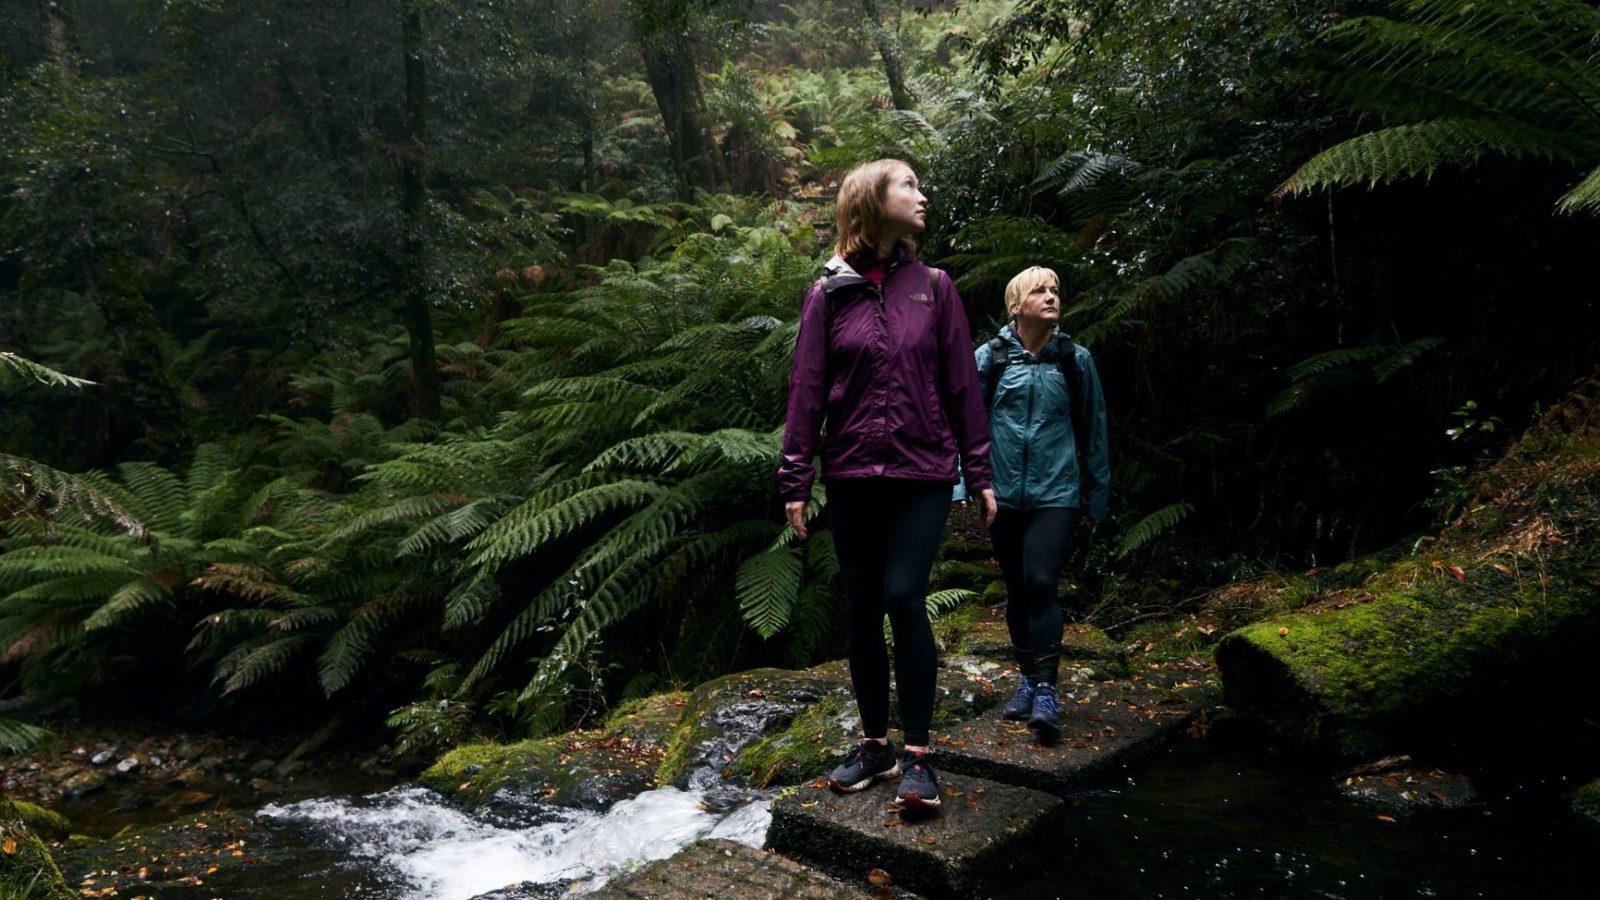 Exploring the Barrington Tops